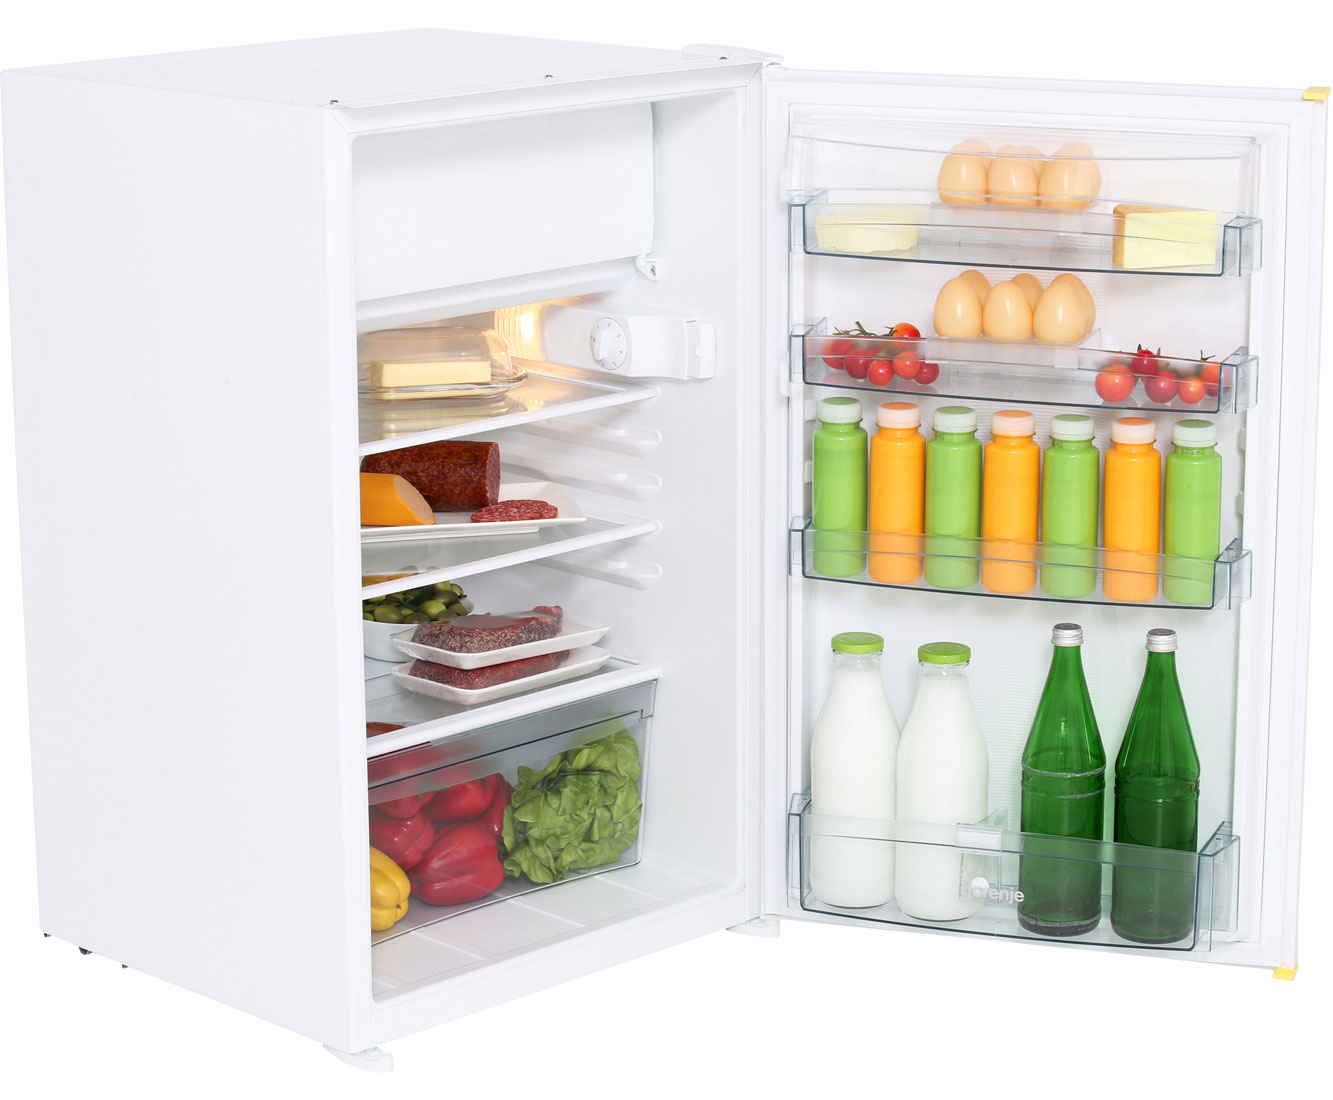 Minibar Kühlschrank Integrierbar : Minibar kühlschrank integrierbar severin tischkühlschrank l